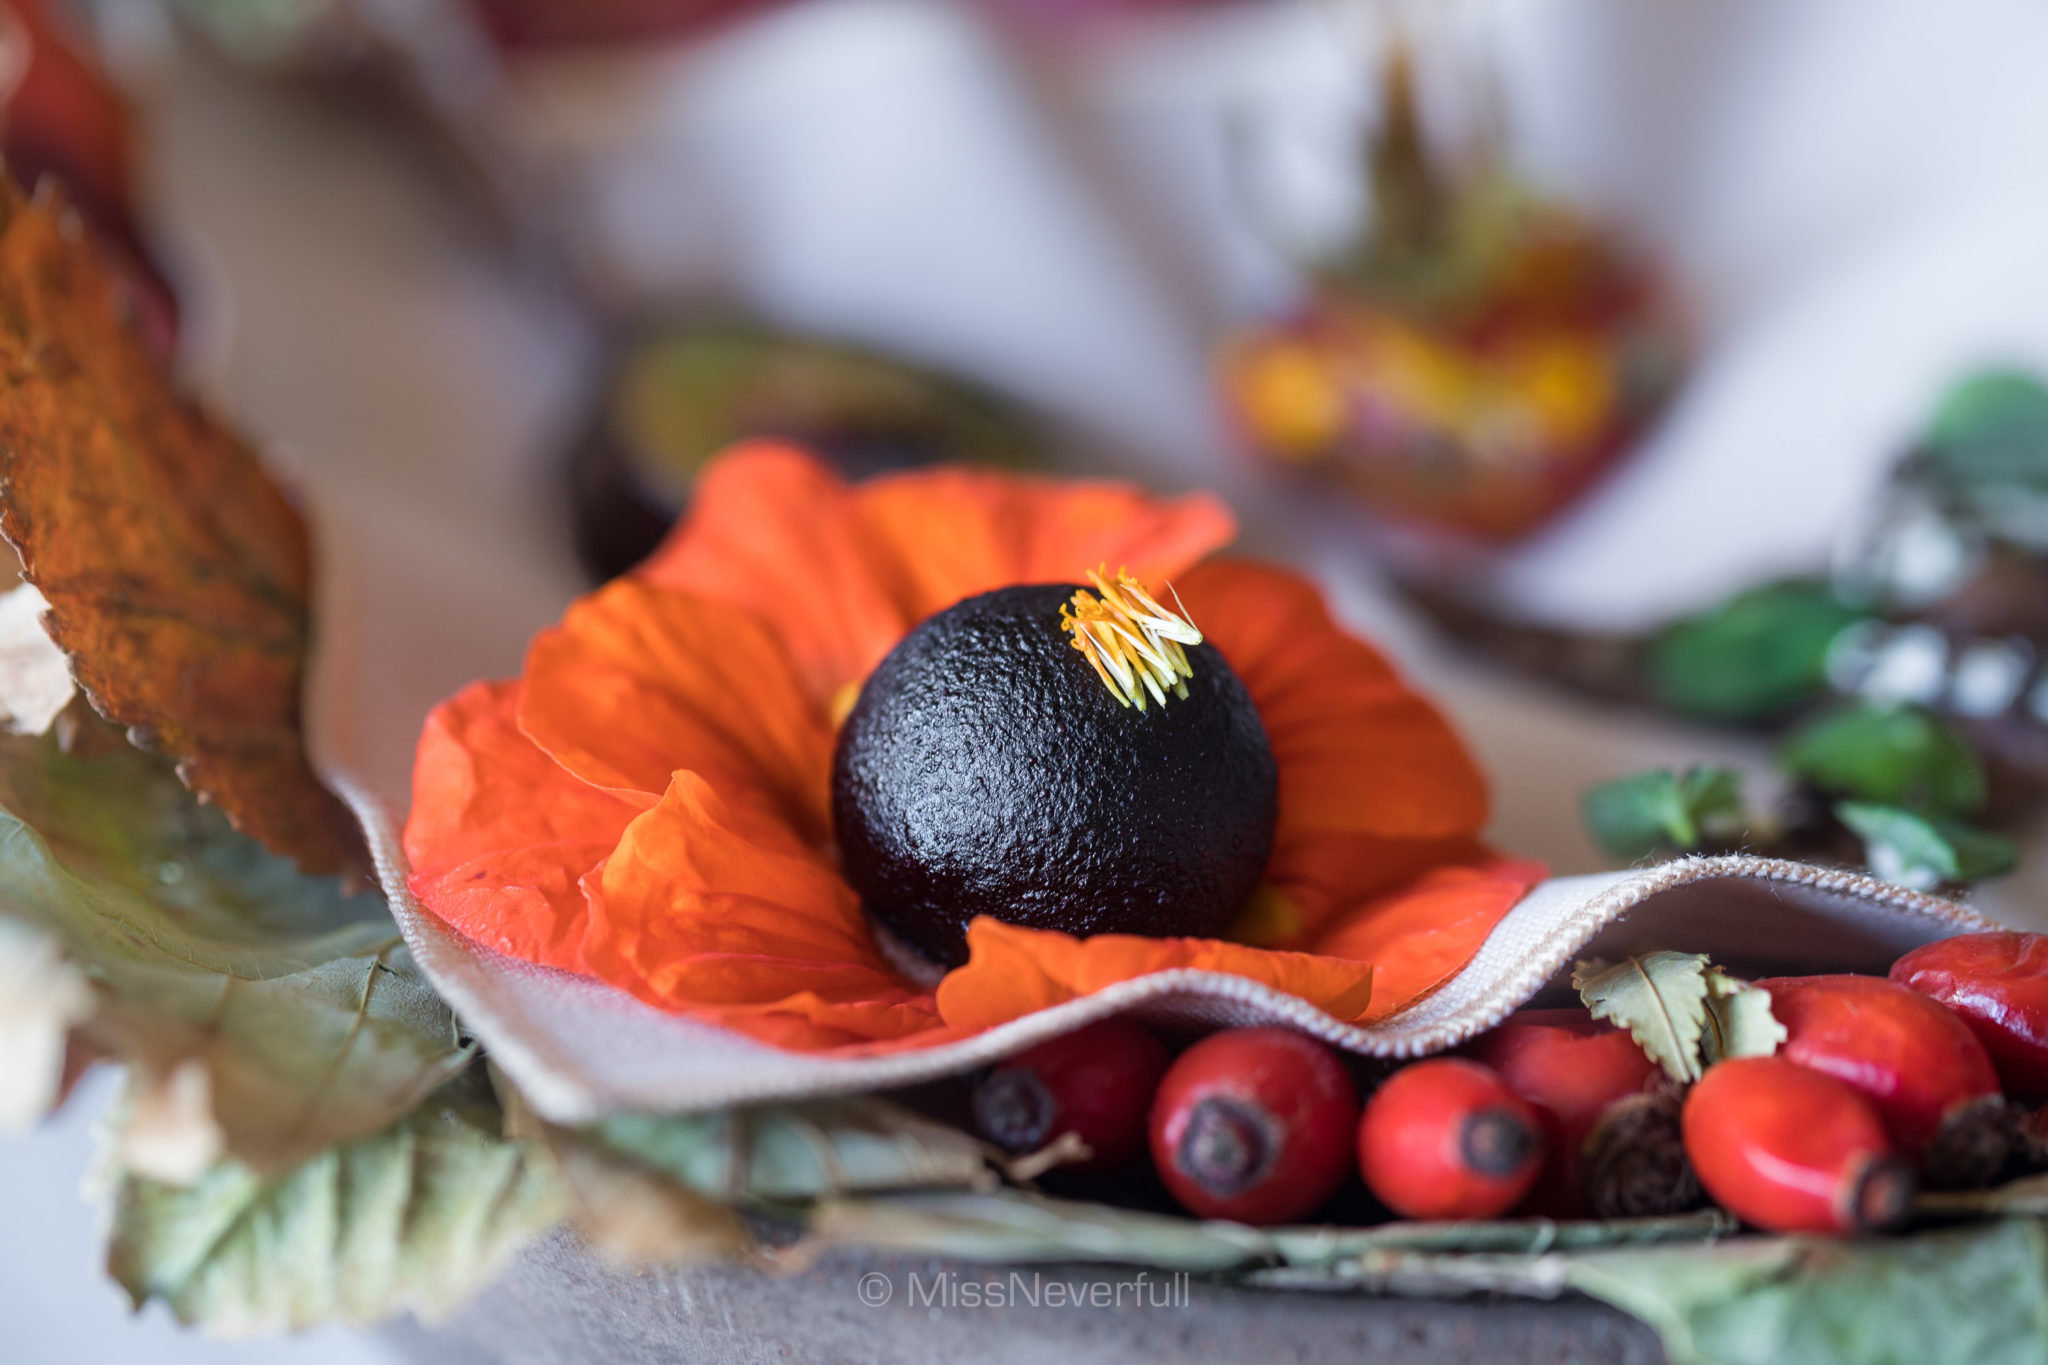 Nasturtium stuffed with black currant berry